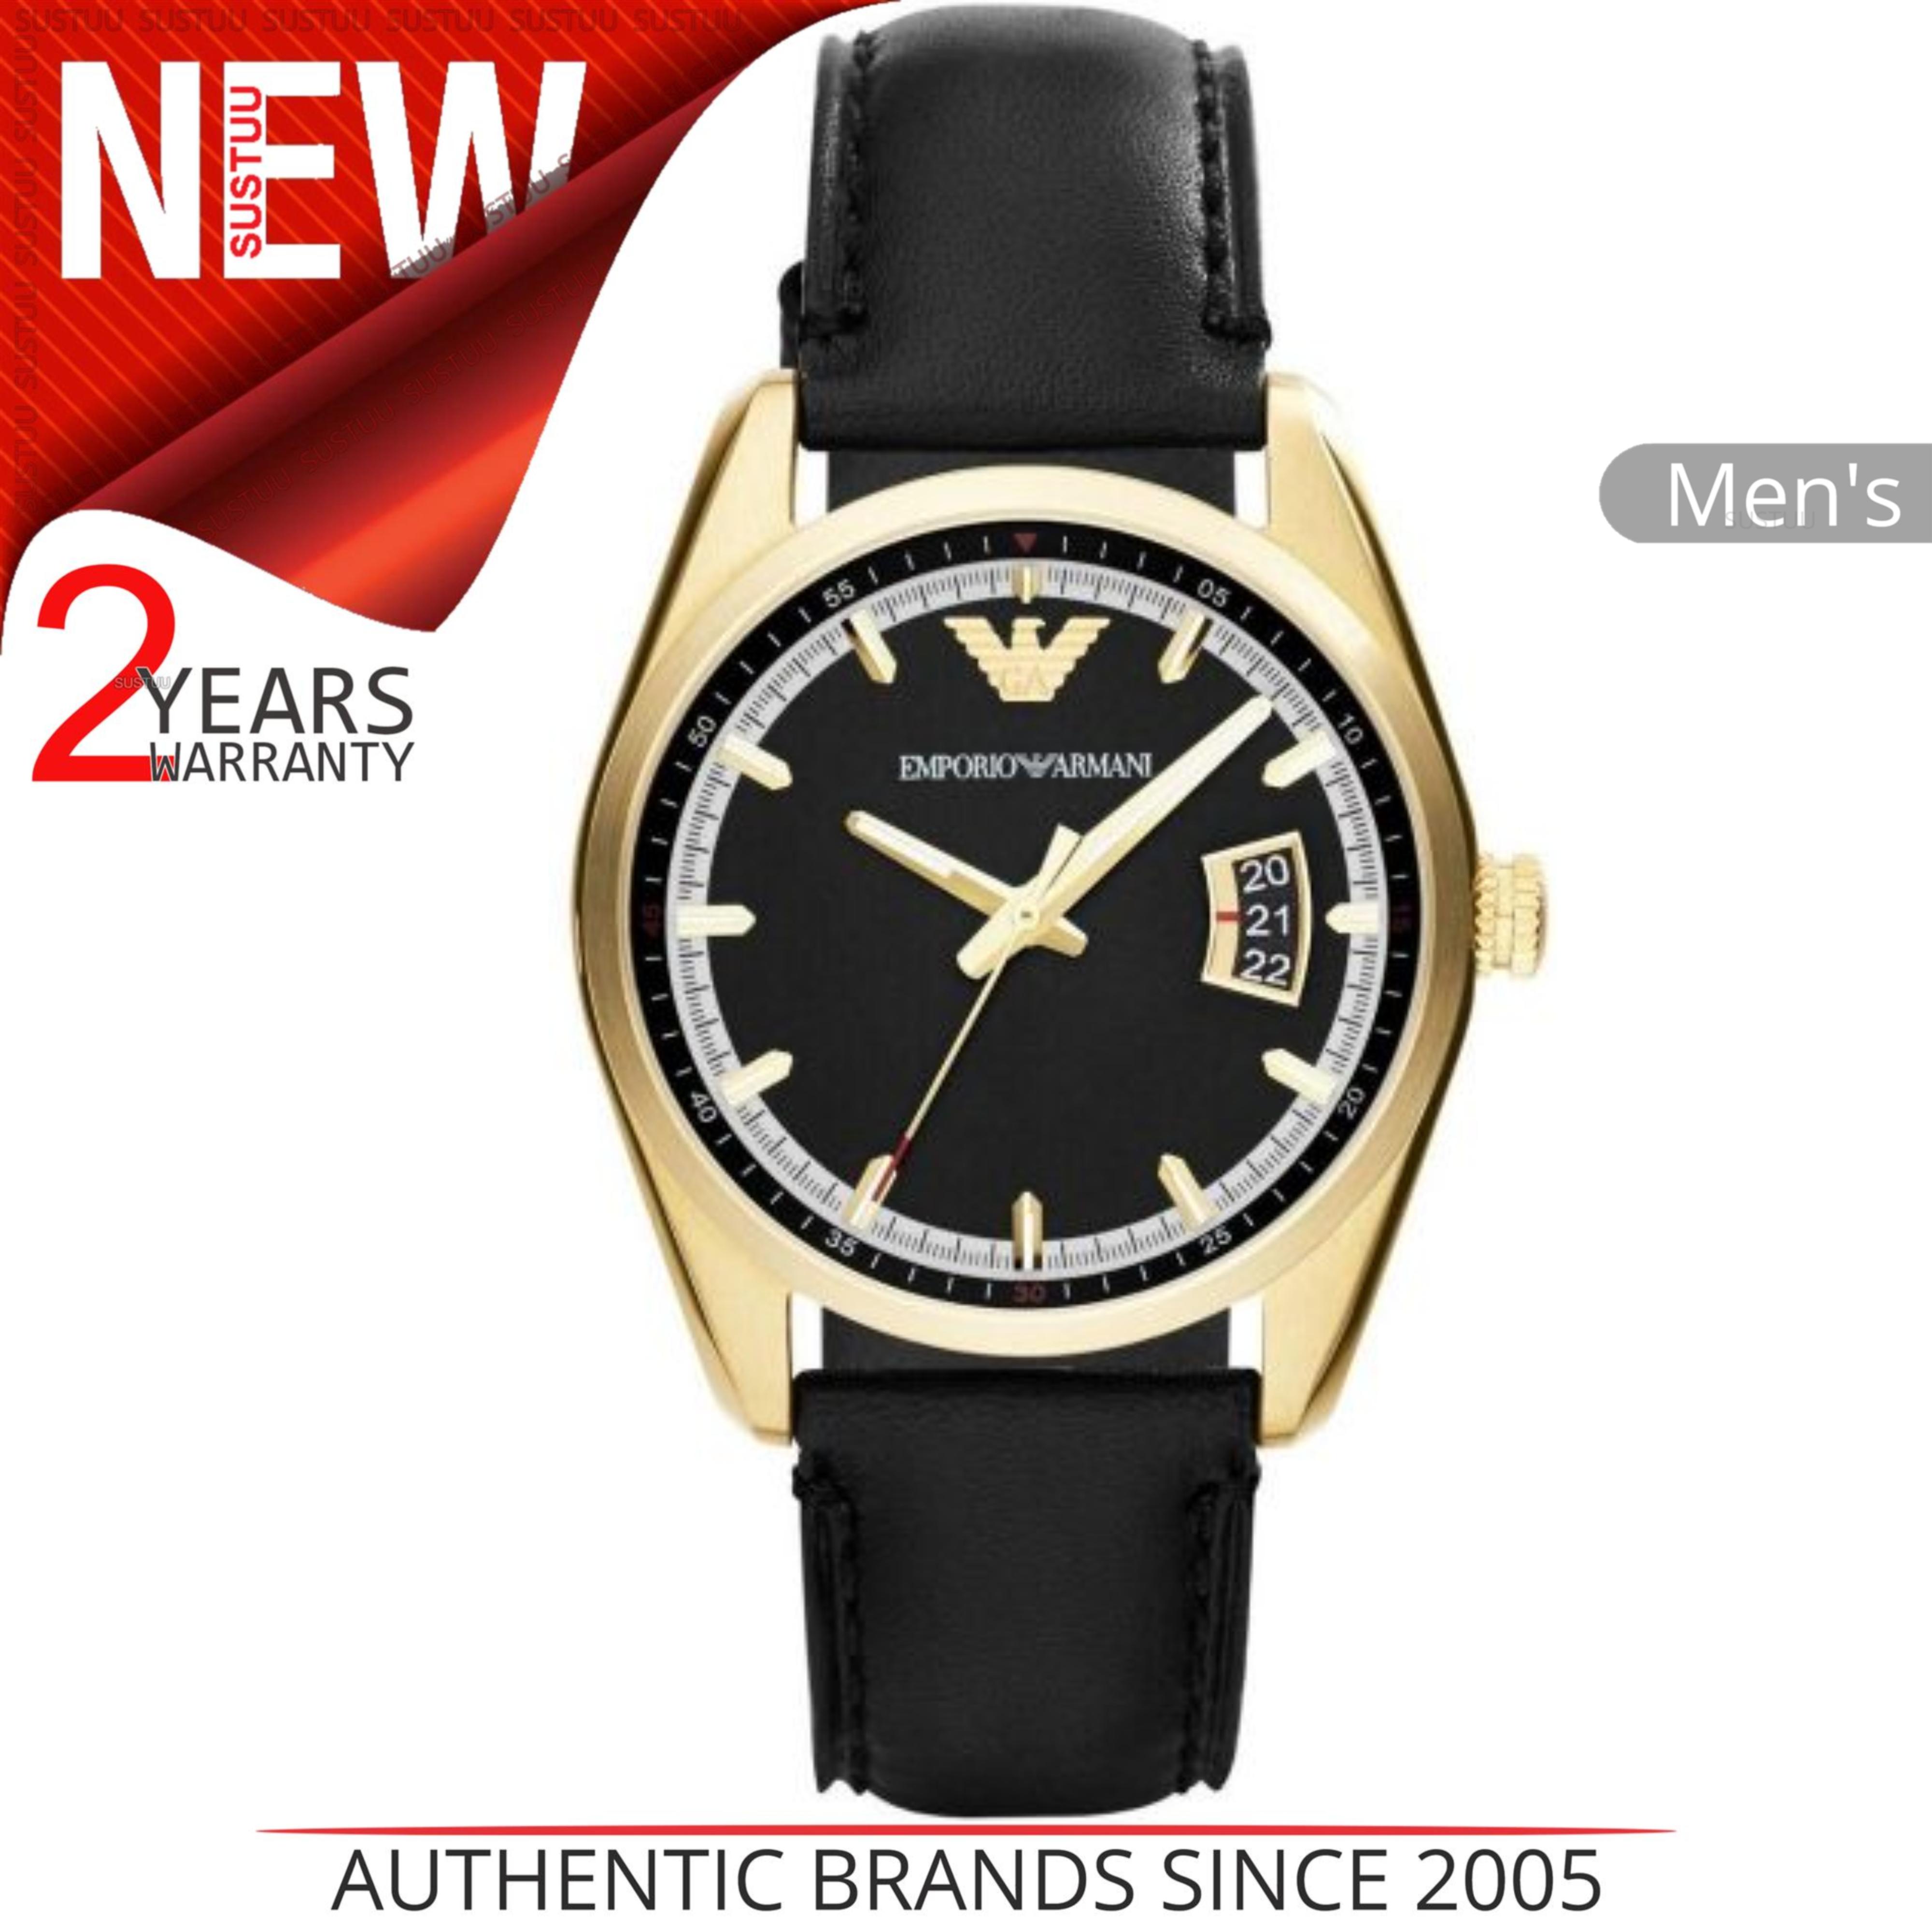 e9ce989d7a5d Sentinel Emporio Armani Sportivo Men s Wrist Watch AR6018│Round Dial│Black  Leather Strap. Sentinel Thumbnail 2